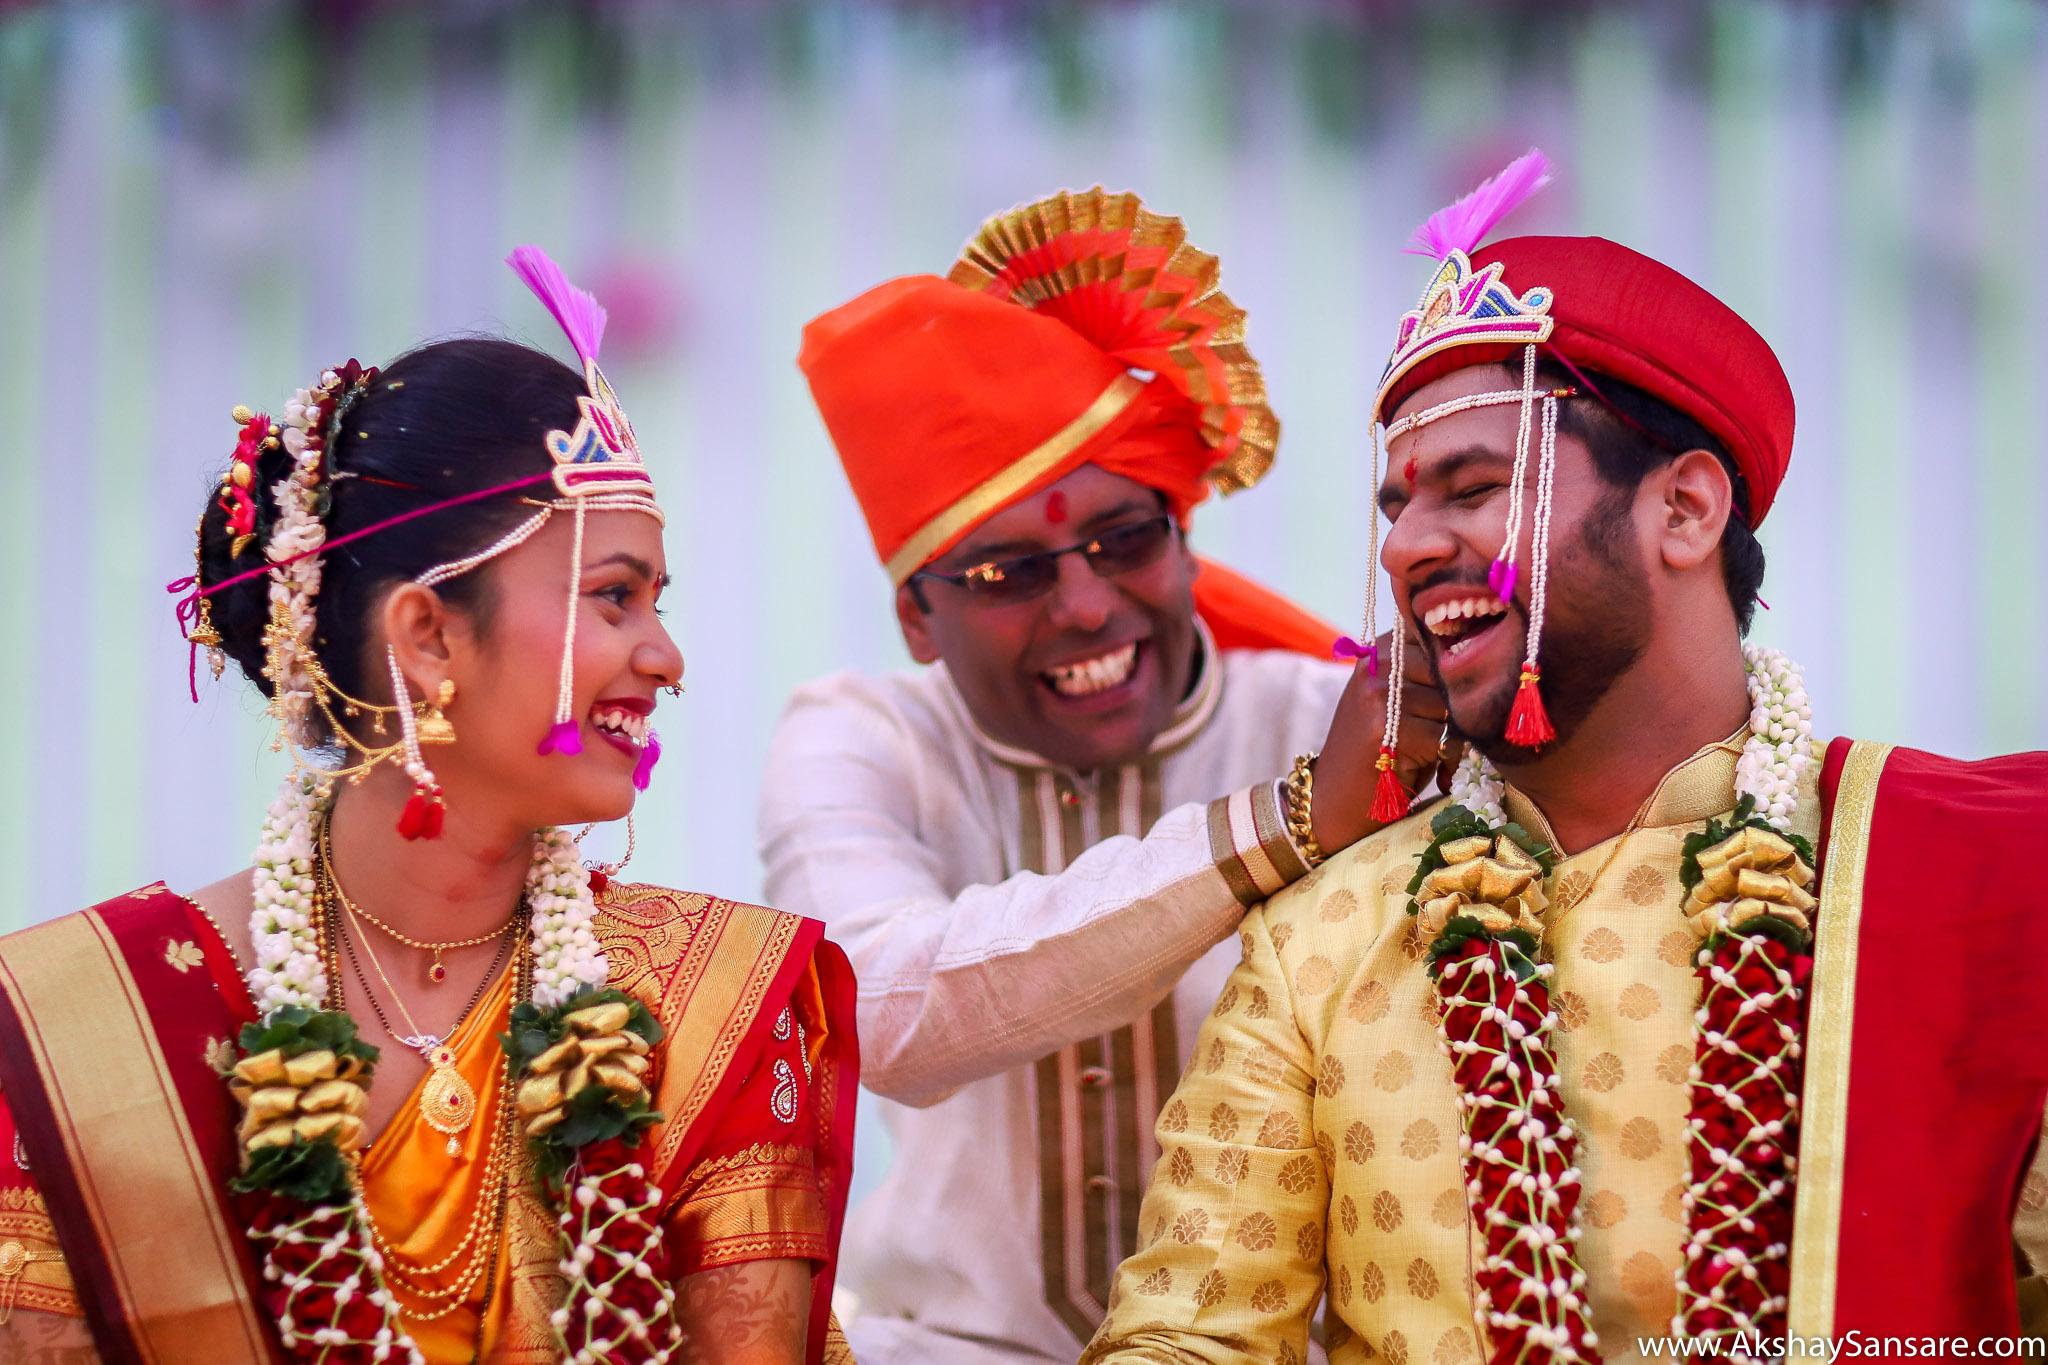 Aditya x Poonam Blog Akshay Sansare Photography Candid Photographer in Mumbai Best Cinematic wedding film filmer-18.jpg